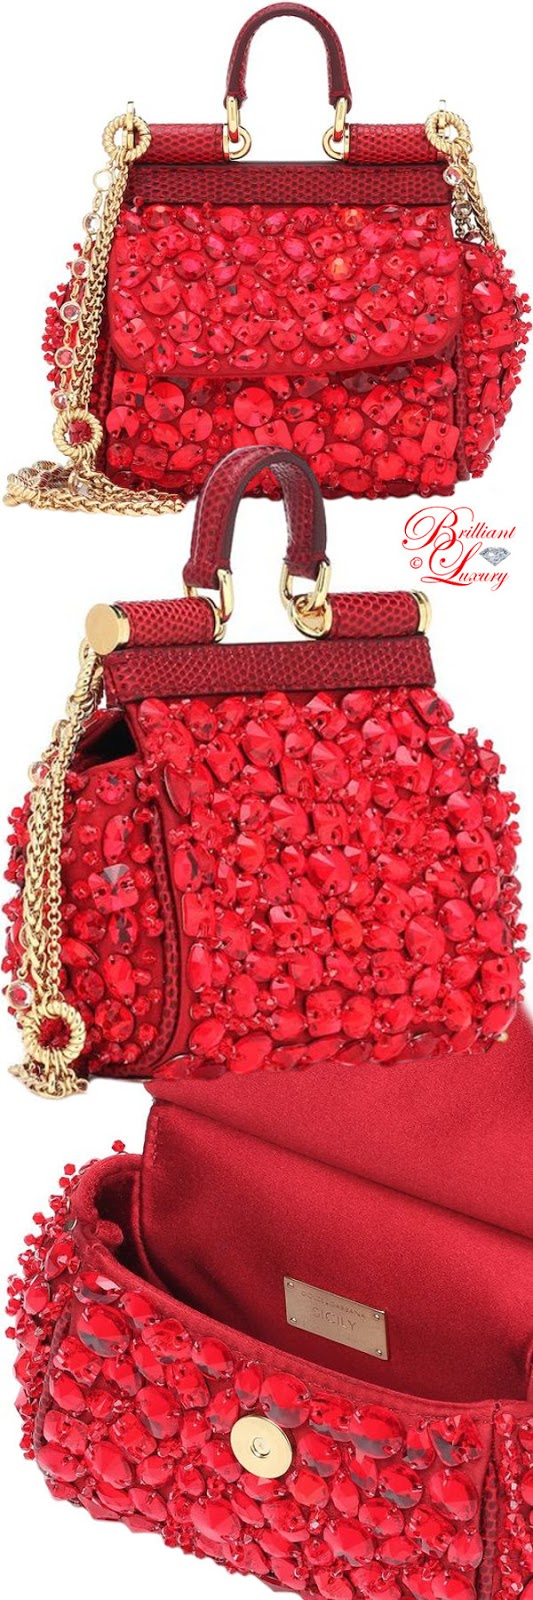 Brilliant Luxury ♦ PANTONE Fashion Color SS 2019 ~ Fiesta ♦ Dolce & Gabbana micro Siciliy embellished shoulder bag #red